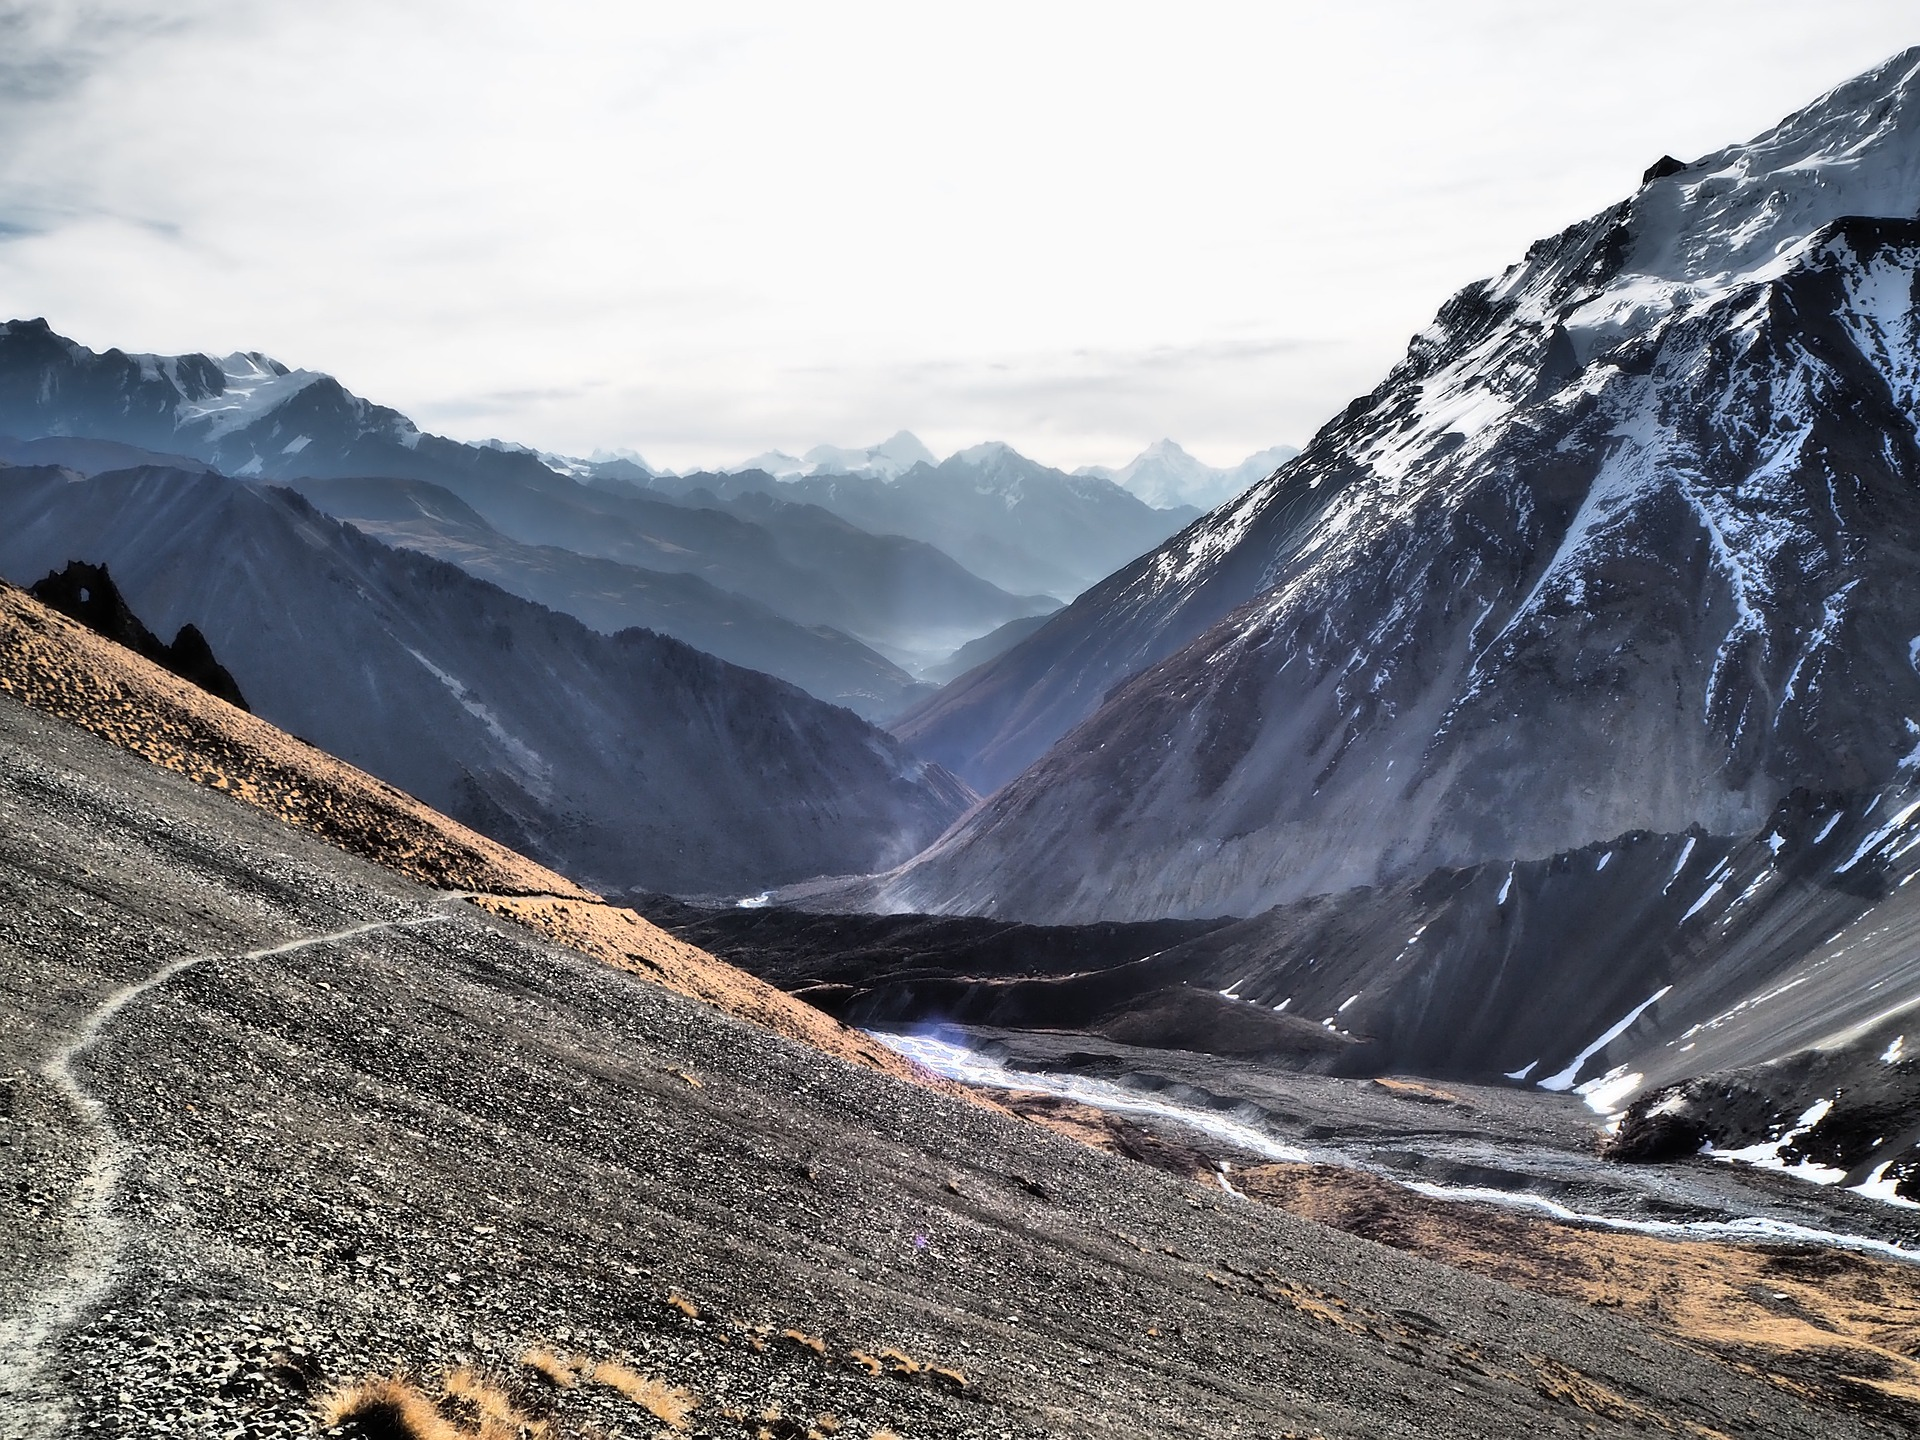 annapurna-circuit-trek-nepal-trail